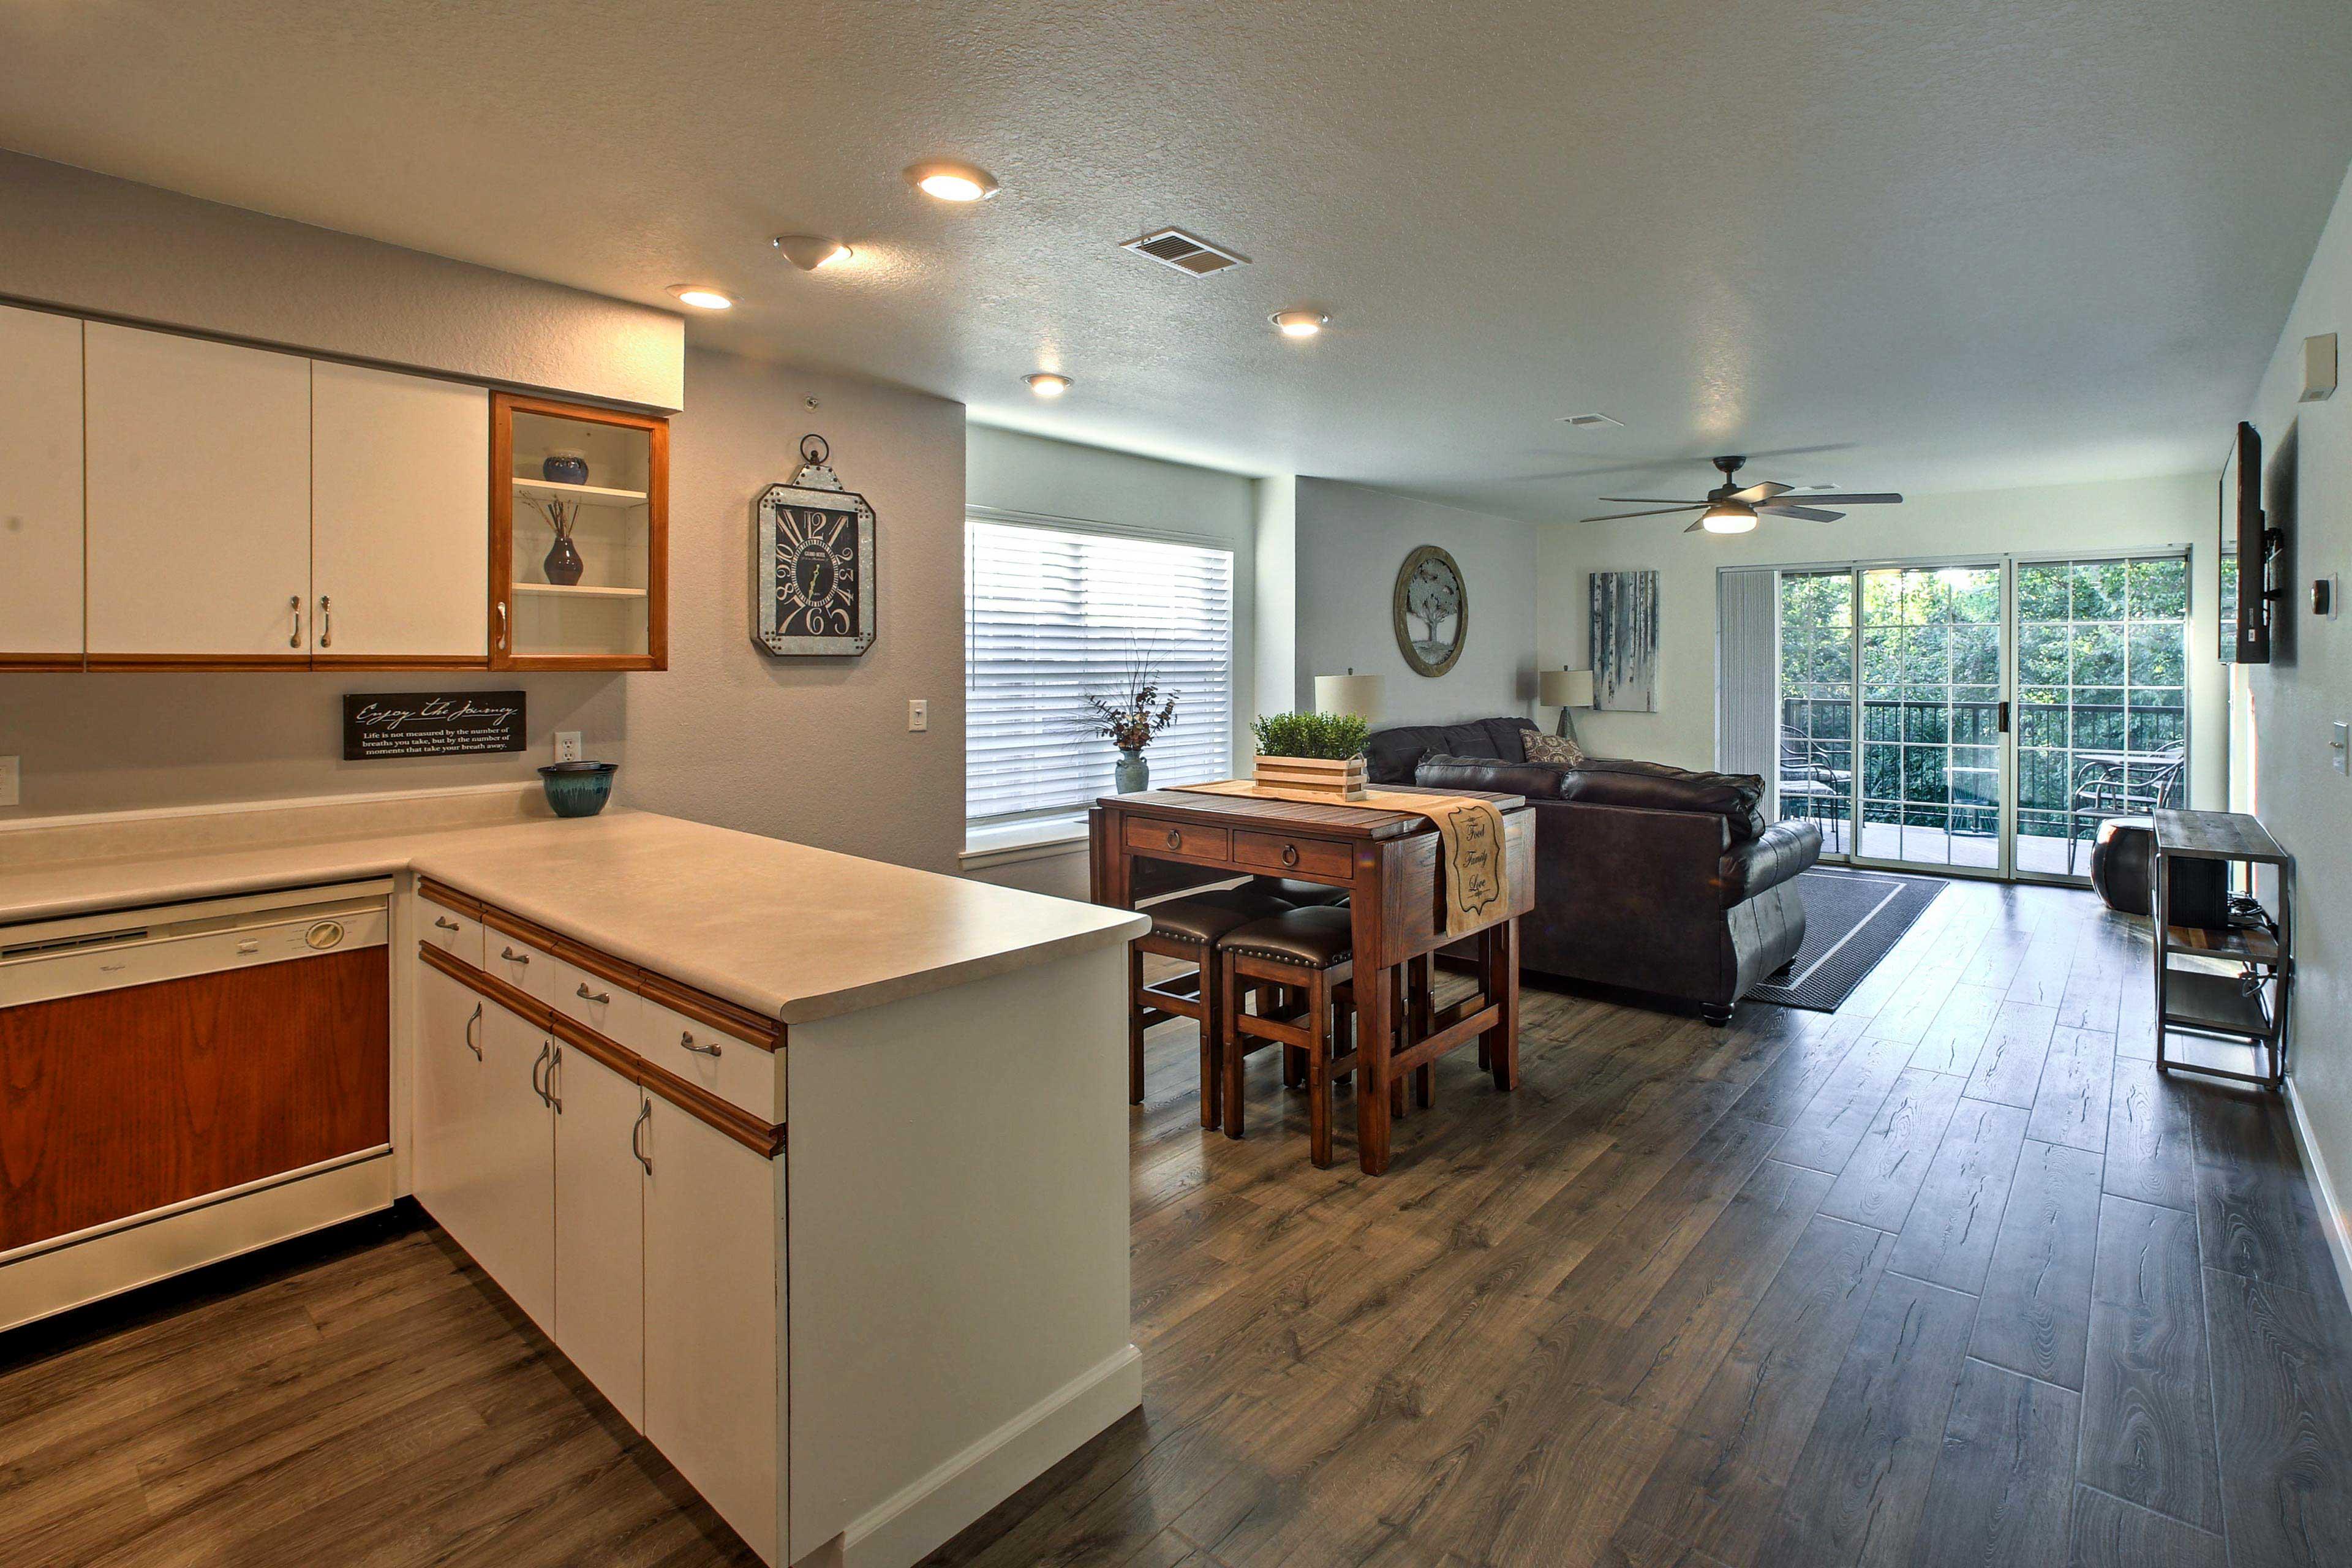 A glass-paneled walls provides ample natural light.